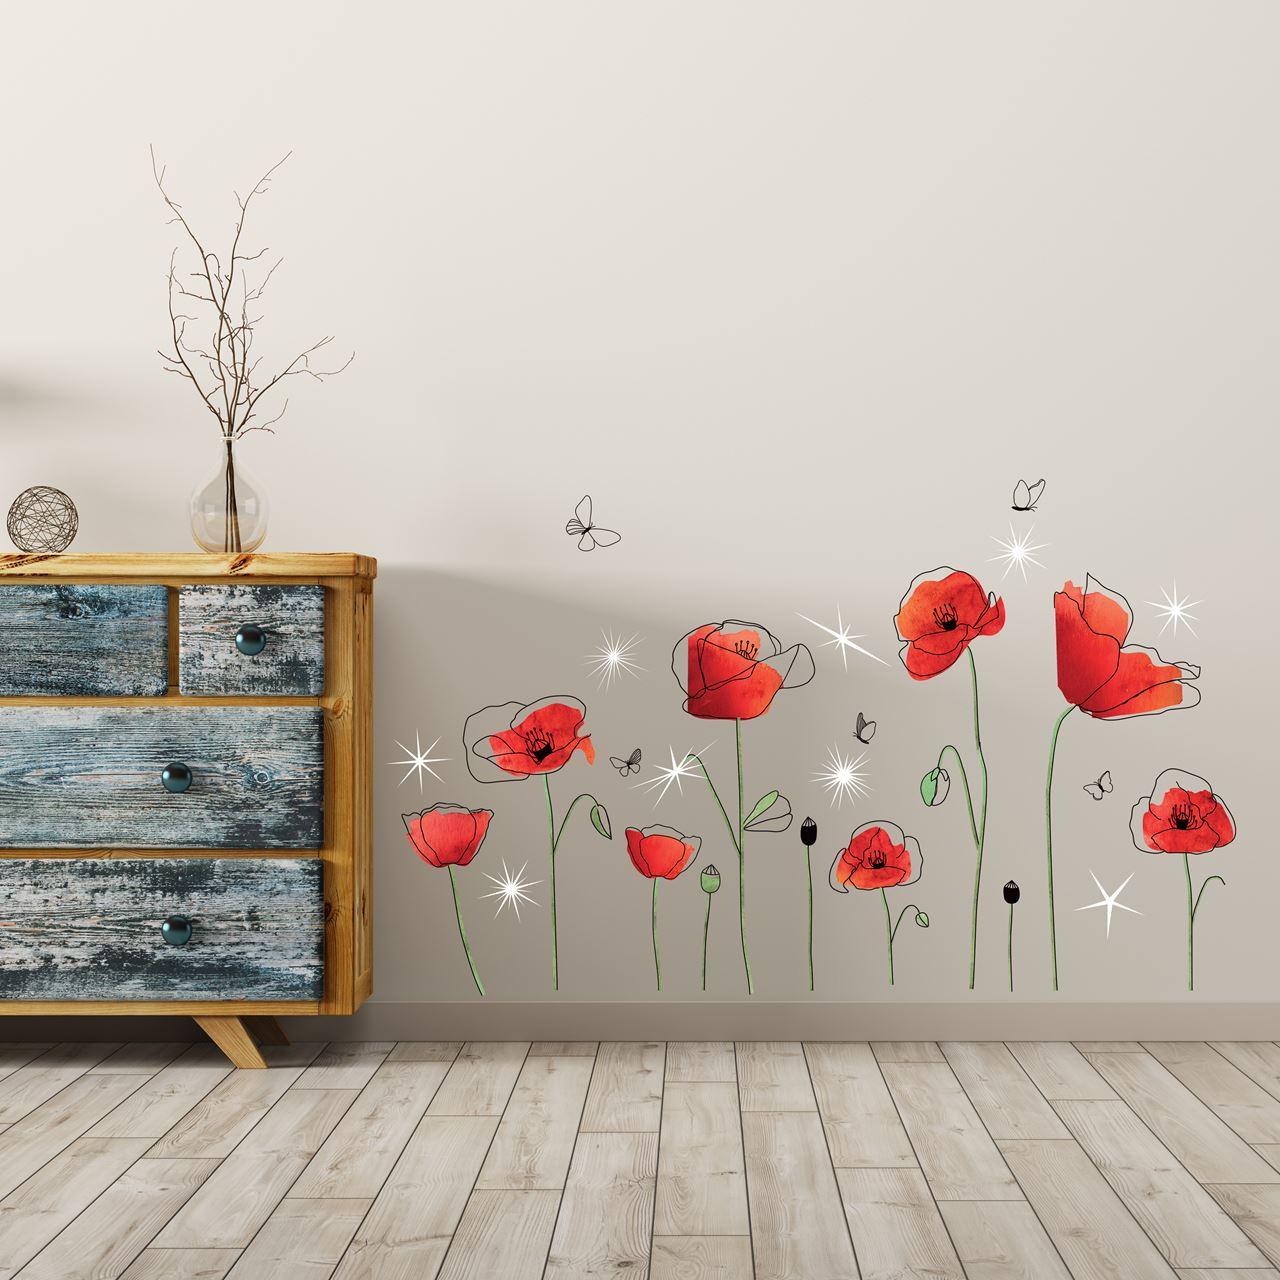 Channeldistribution walplus home decoratie sticker klaprozen met 9 swarovski kristallen - Home decoratie met tomettes ...